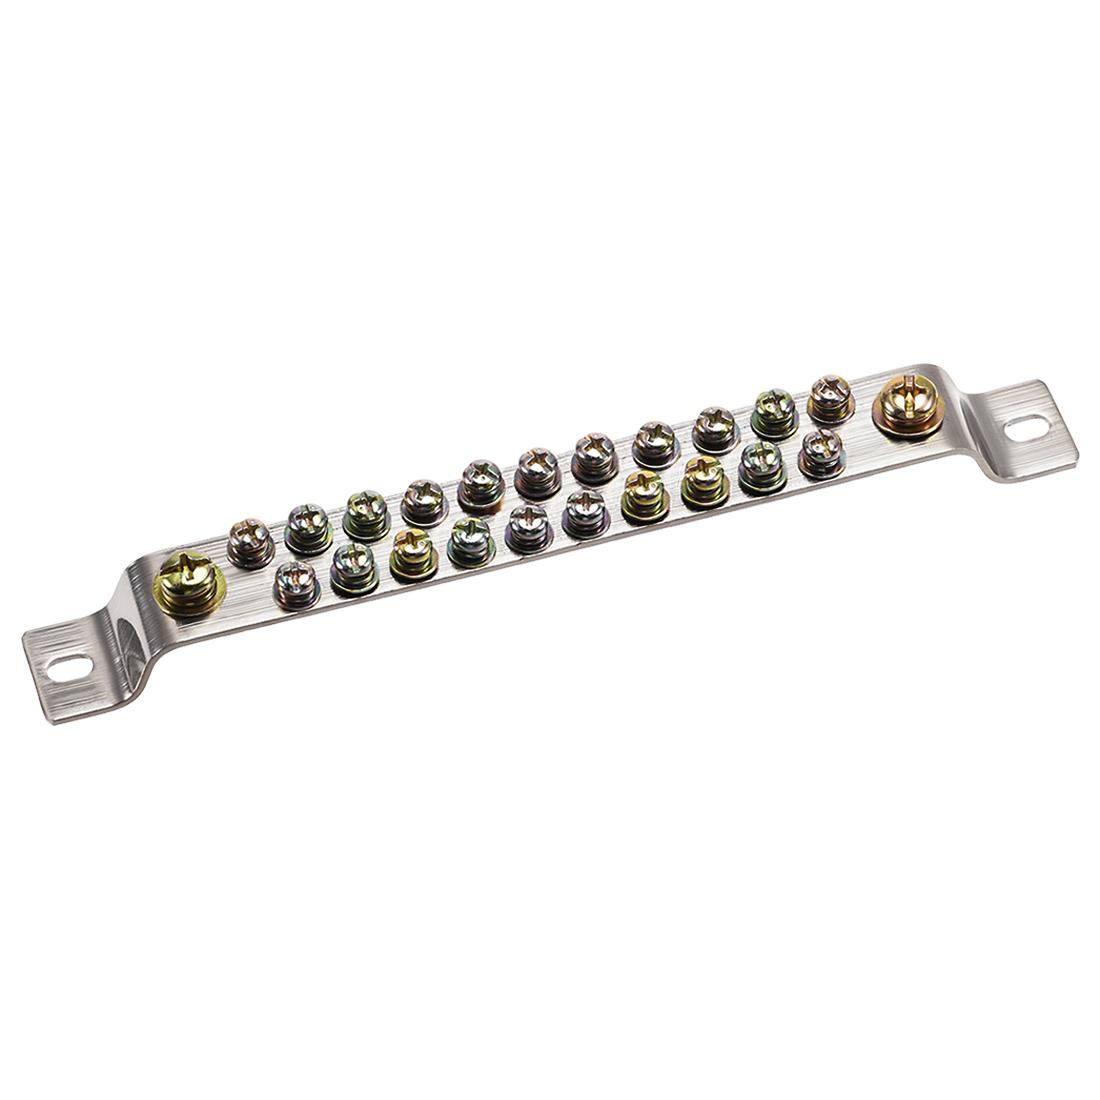 Copper Screw Terminal Block Bar 100A Double Row Bridge Shape 23 Positions